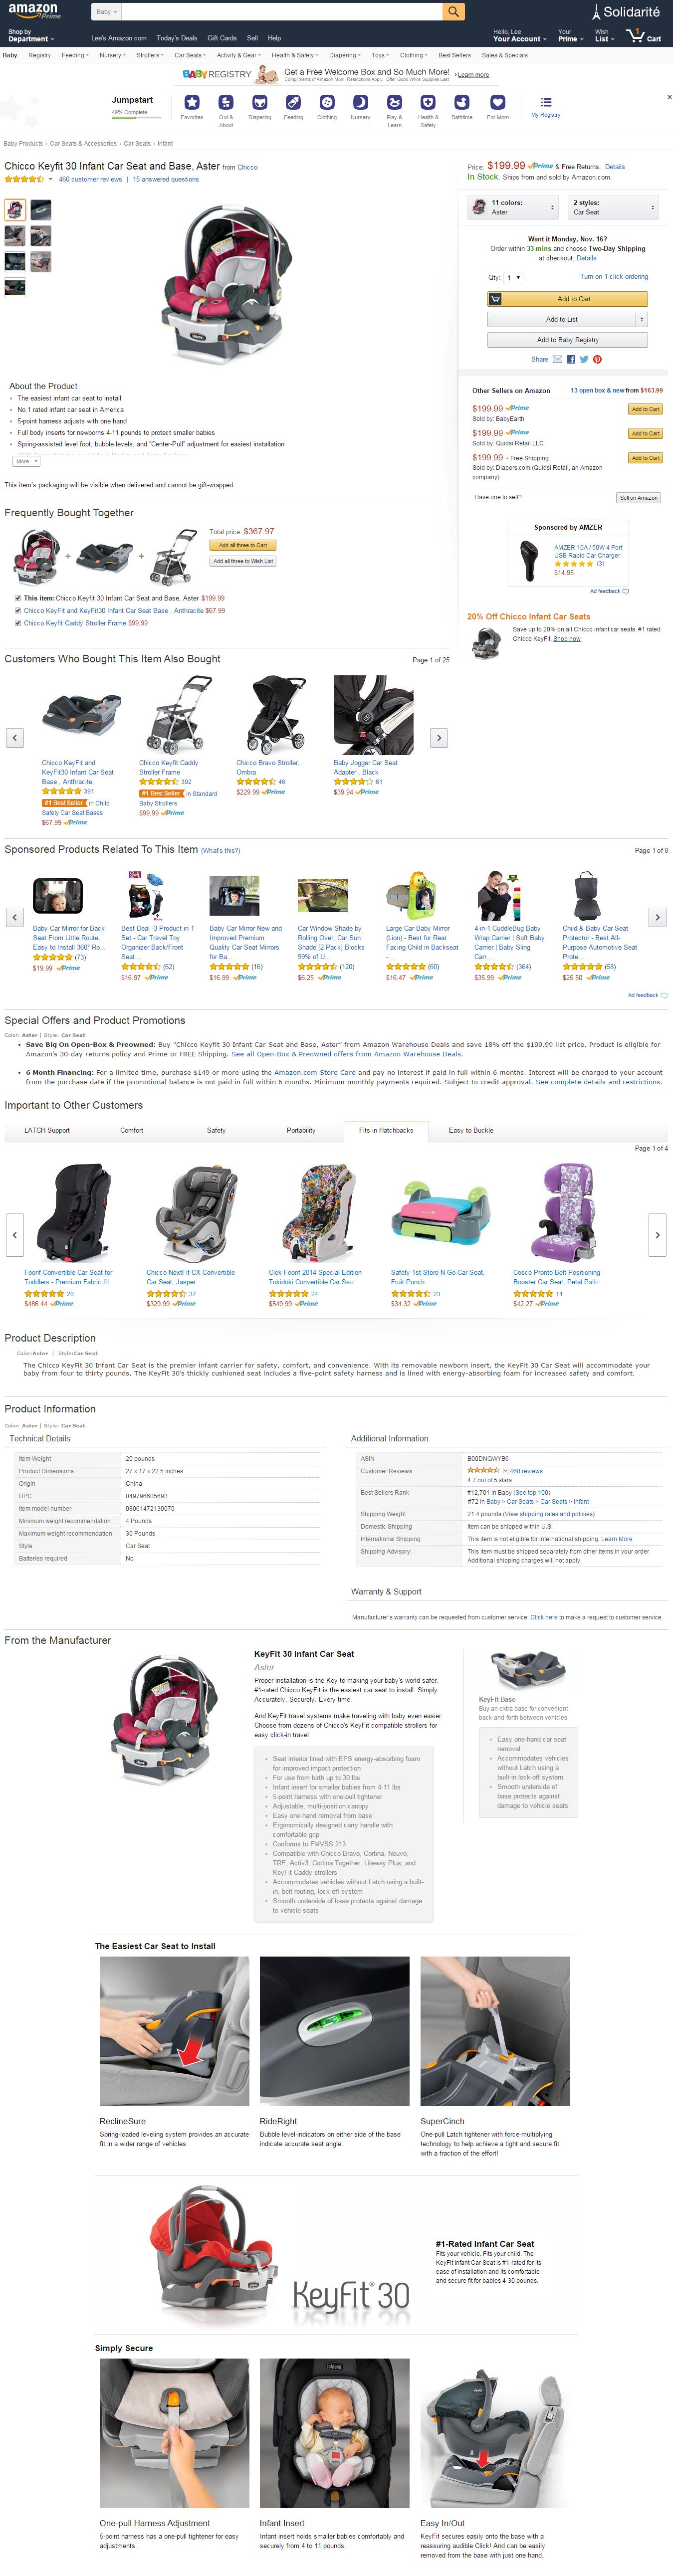 chicco keyfit 30 car seat manual